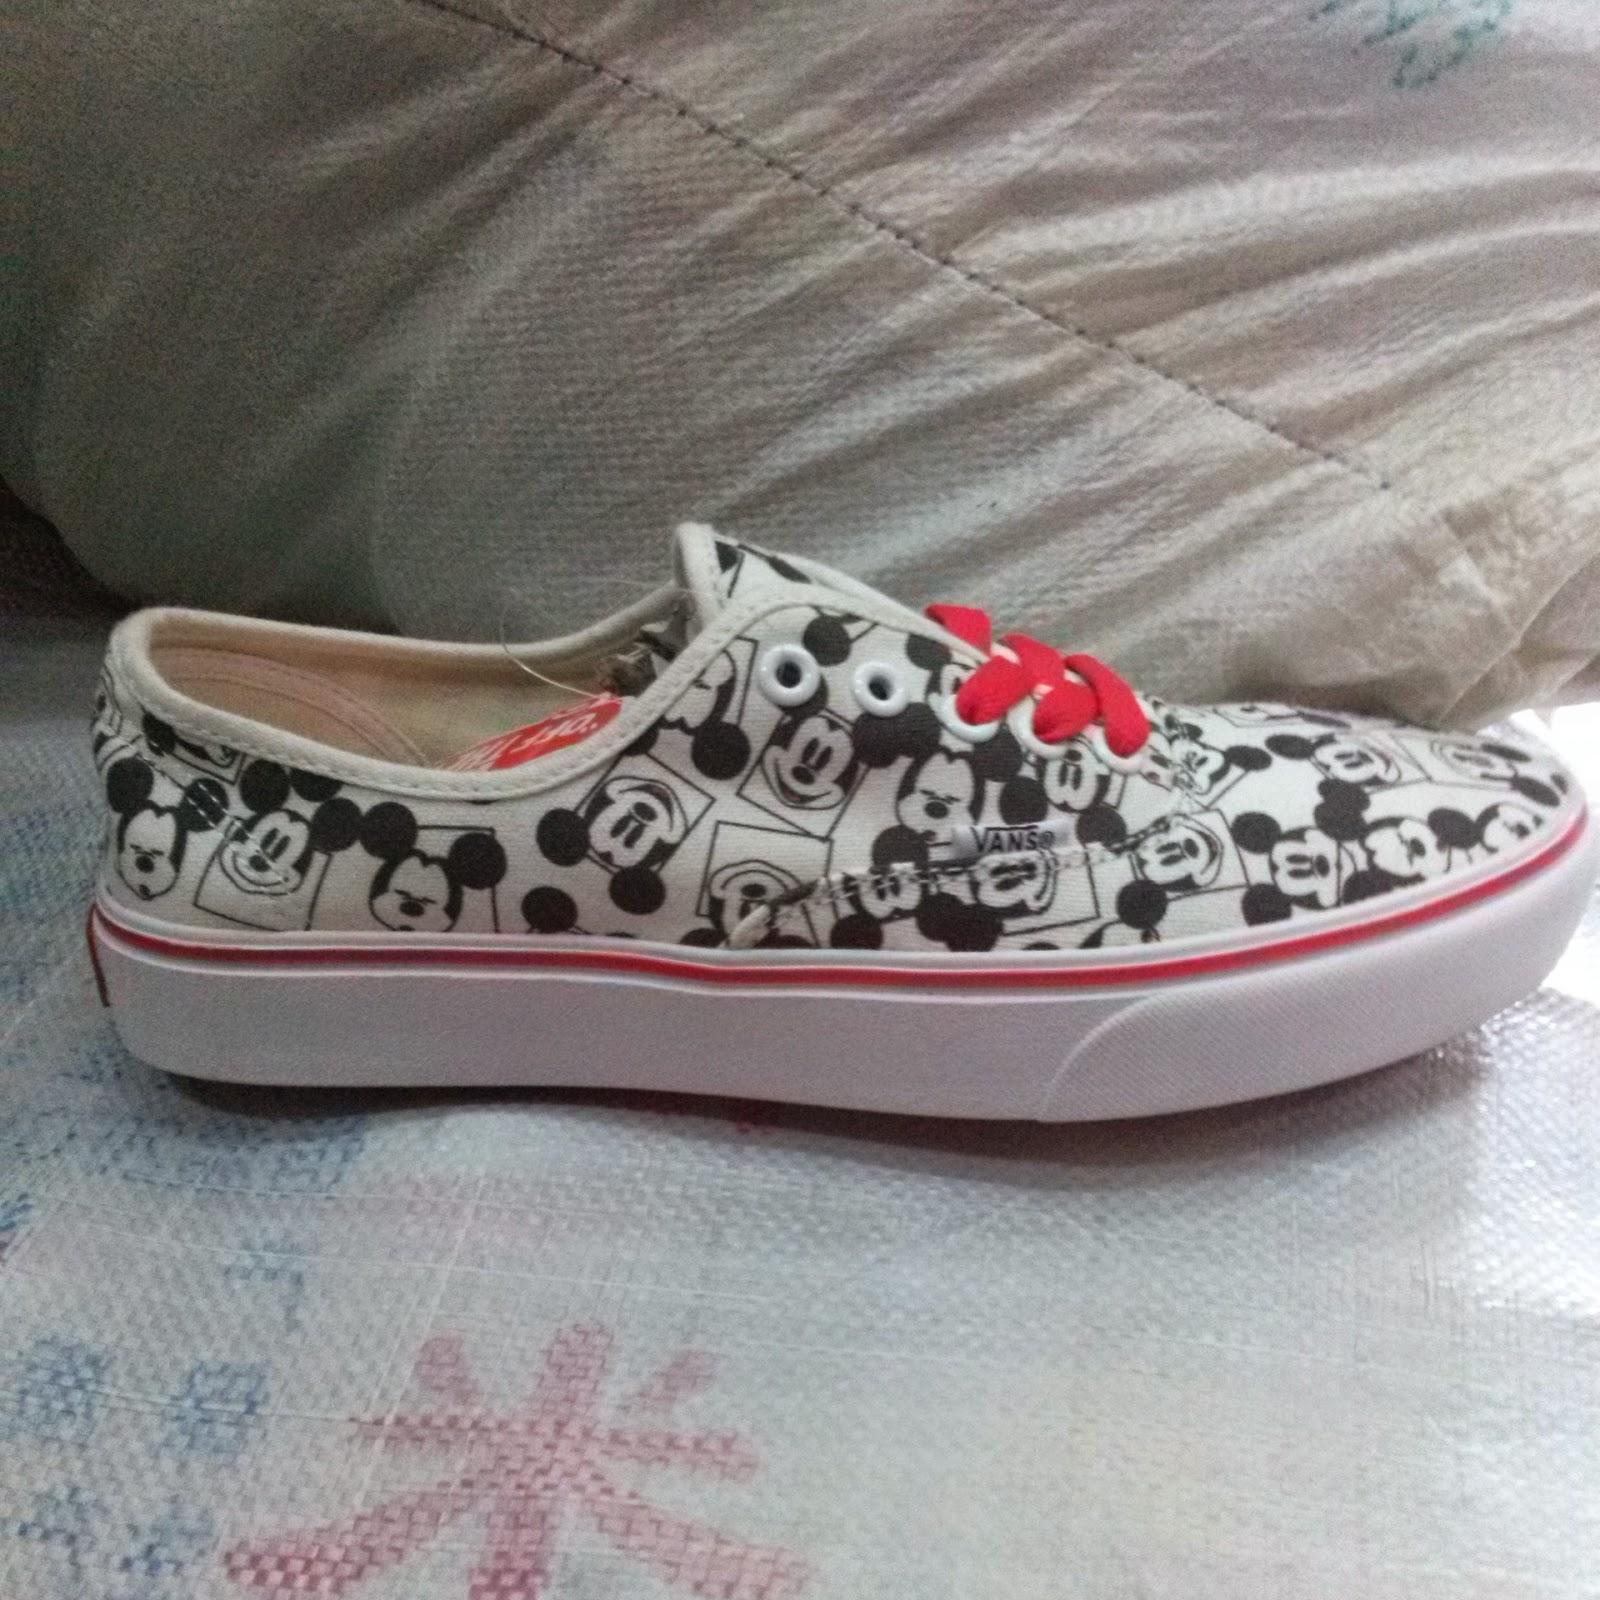 sepatu vans motif donal bebek micky mouse spiderman dan marvel